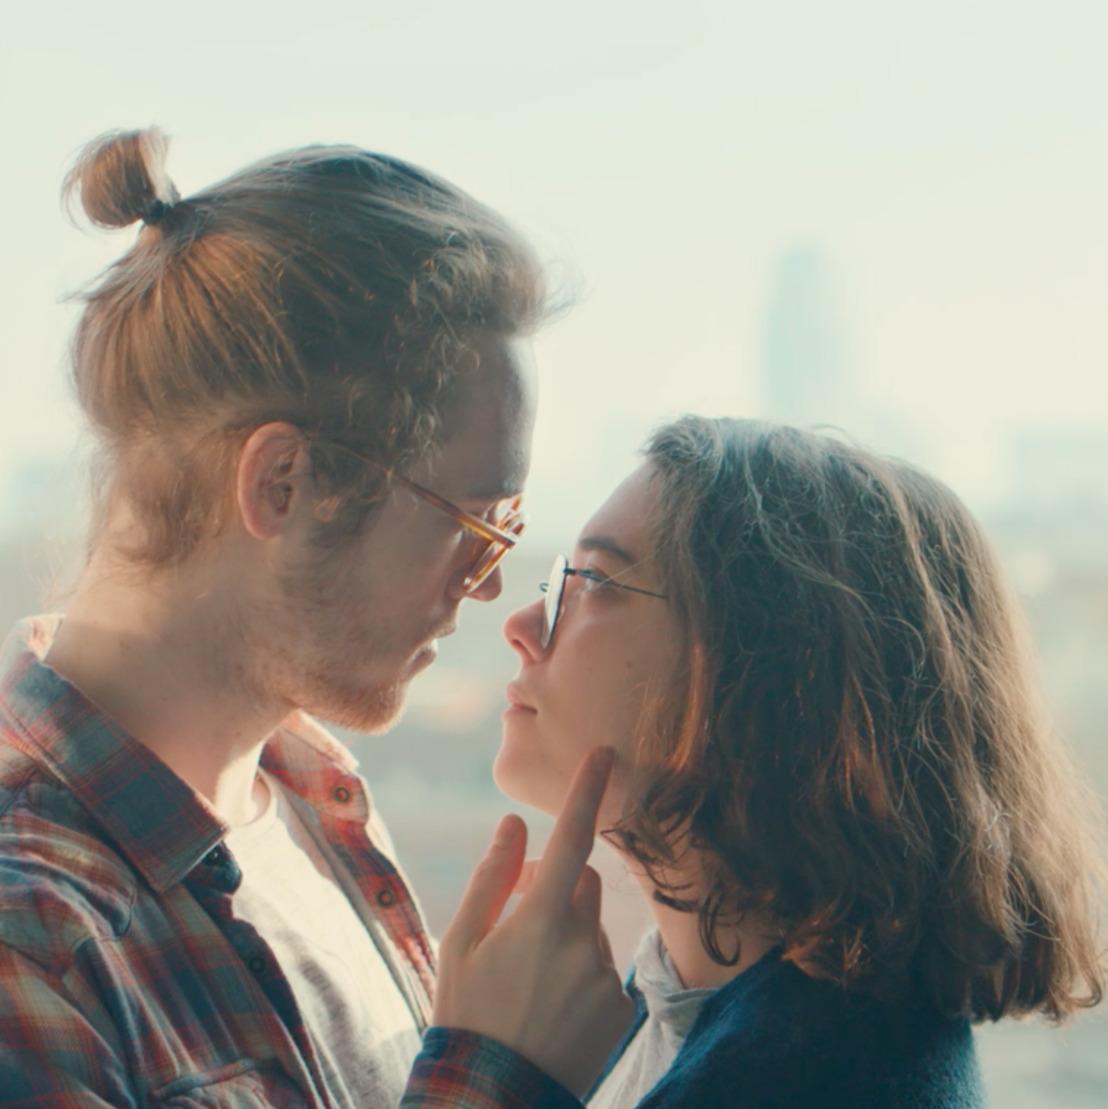 gênant dating Videos beste Gay Lesbische dating sites